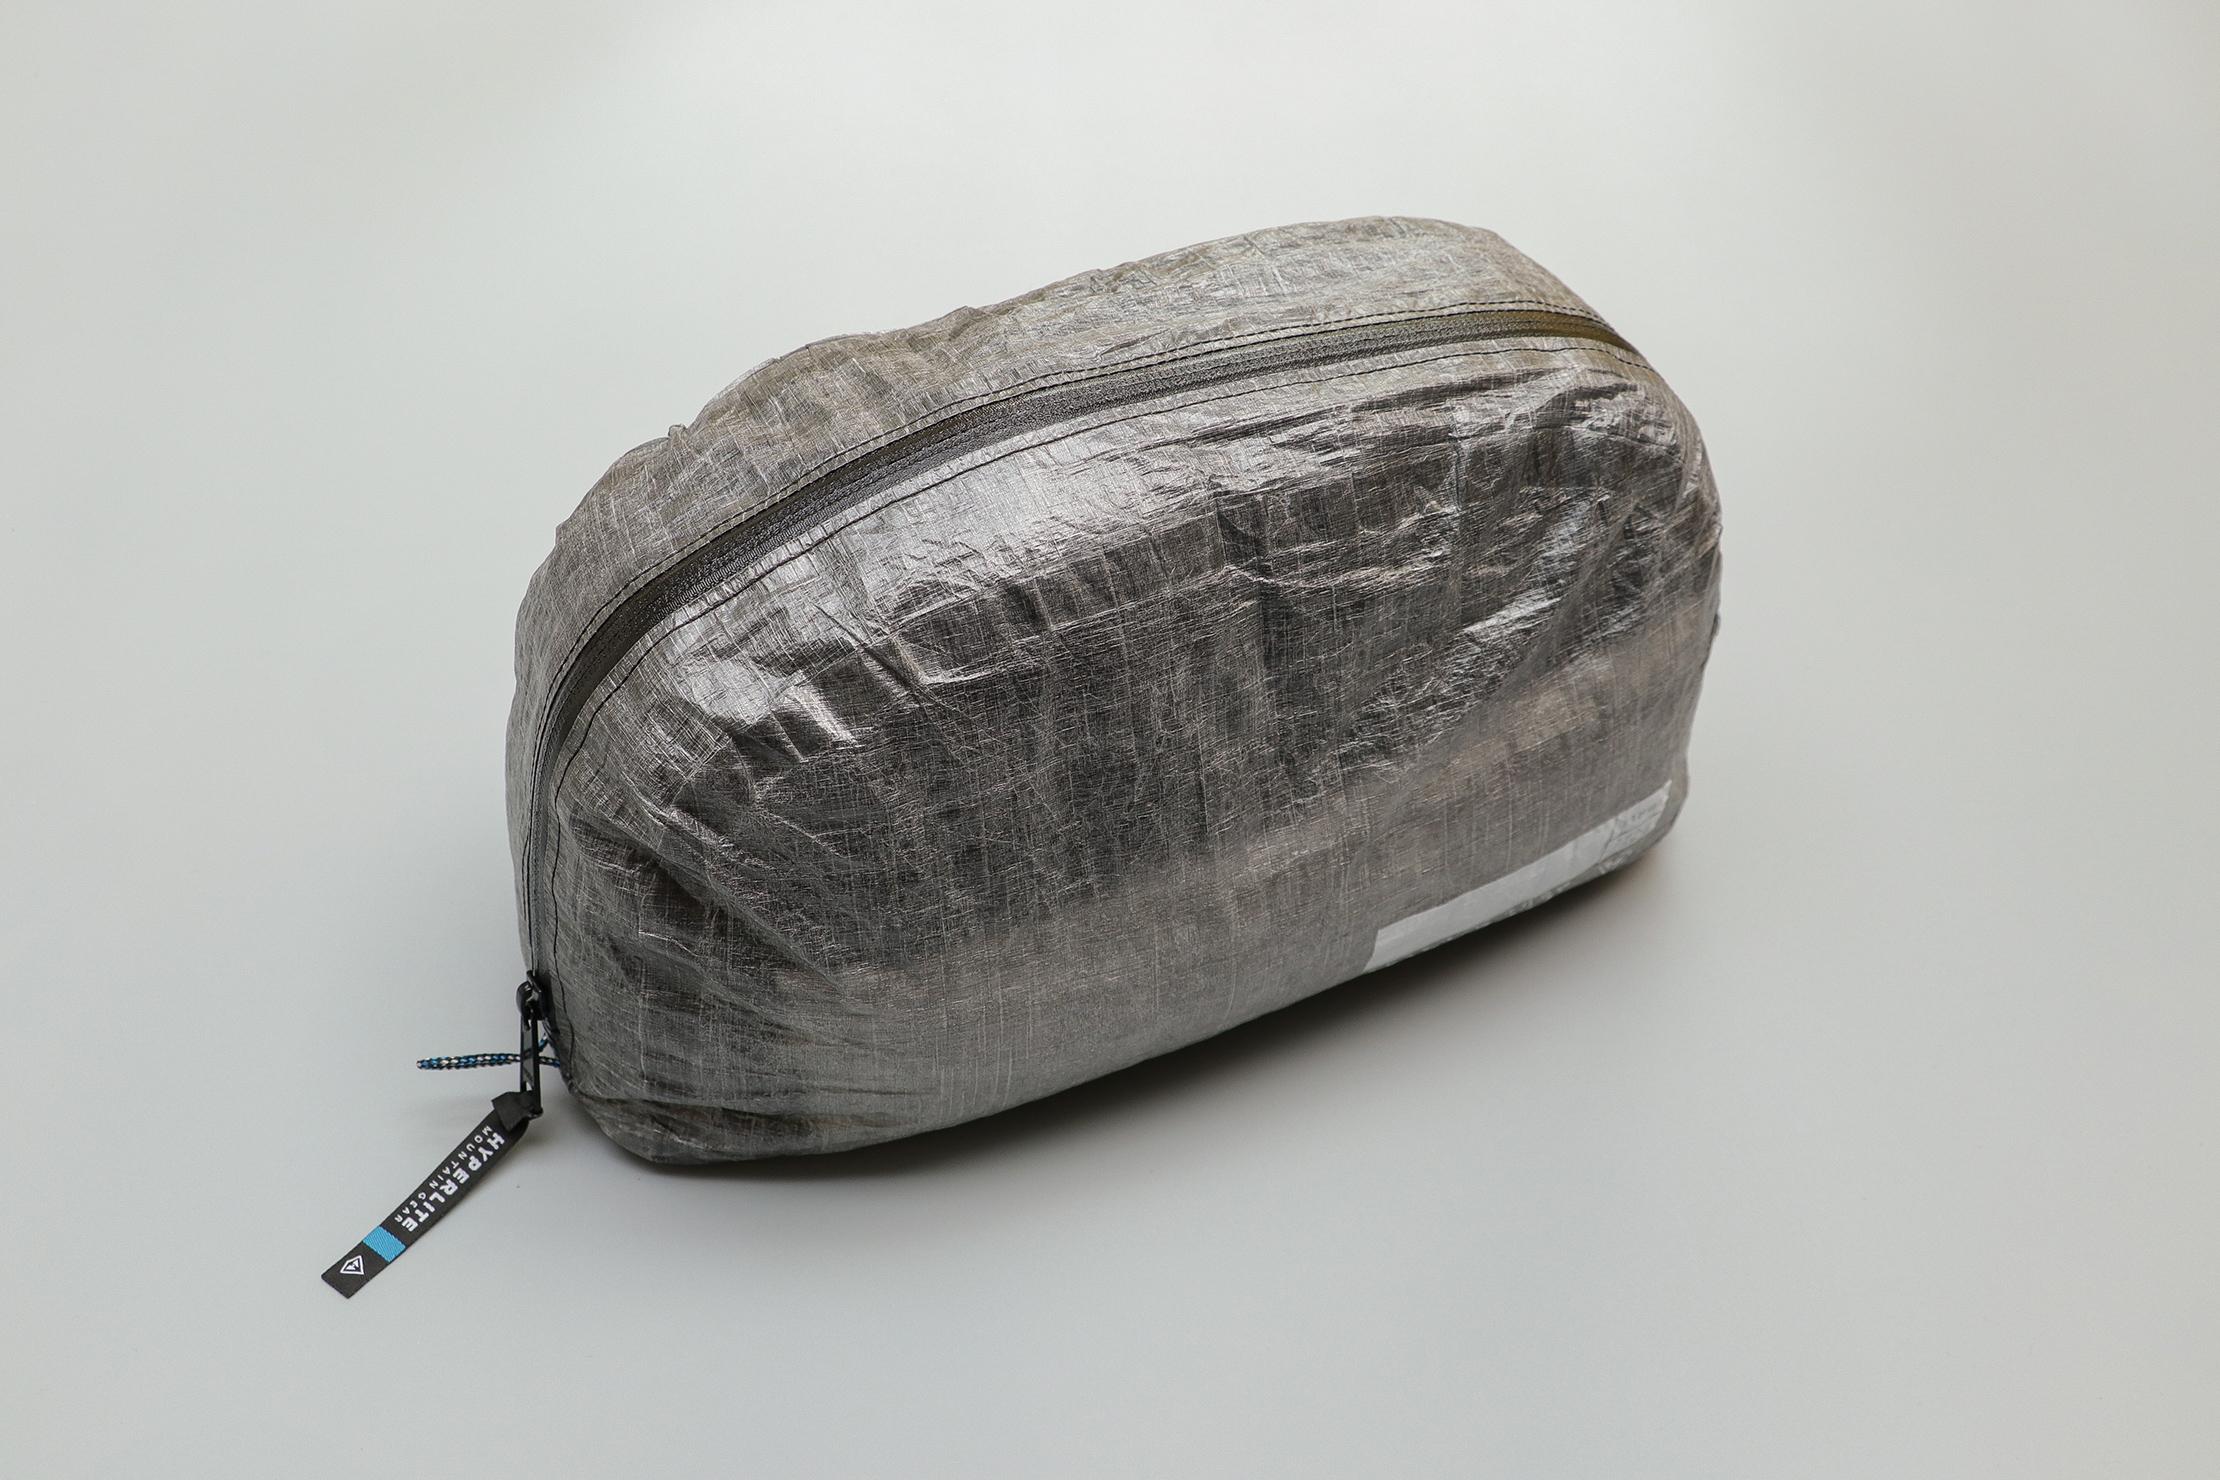 Hyperlite Mountain Gear Pod Standing Up